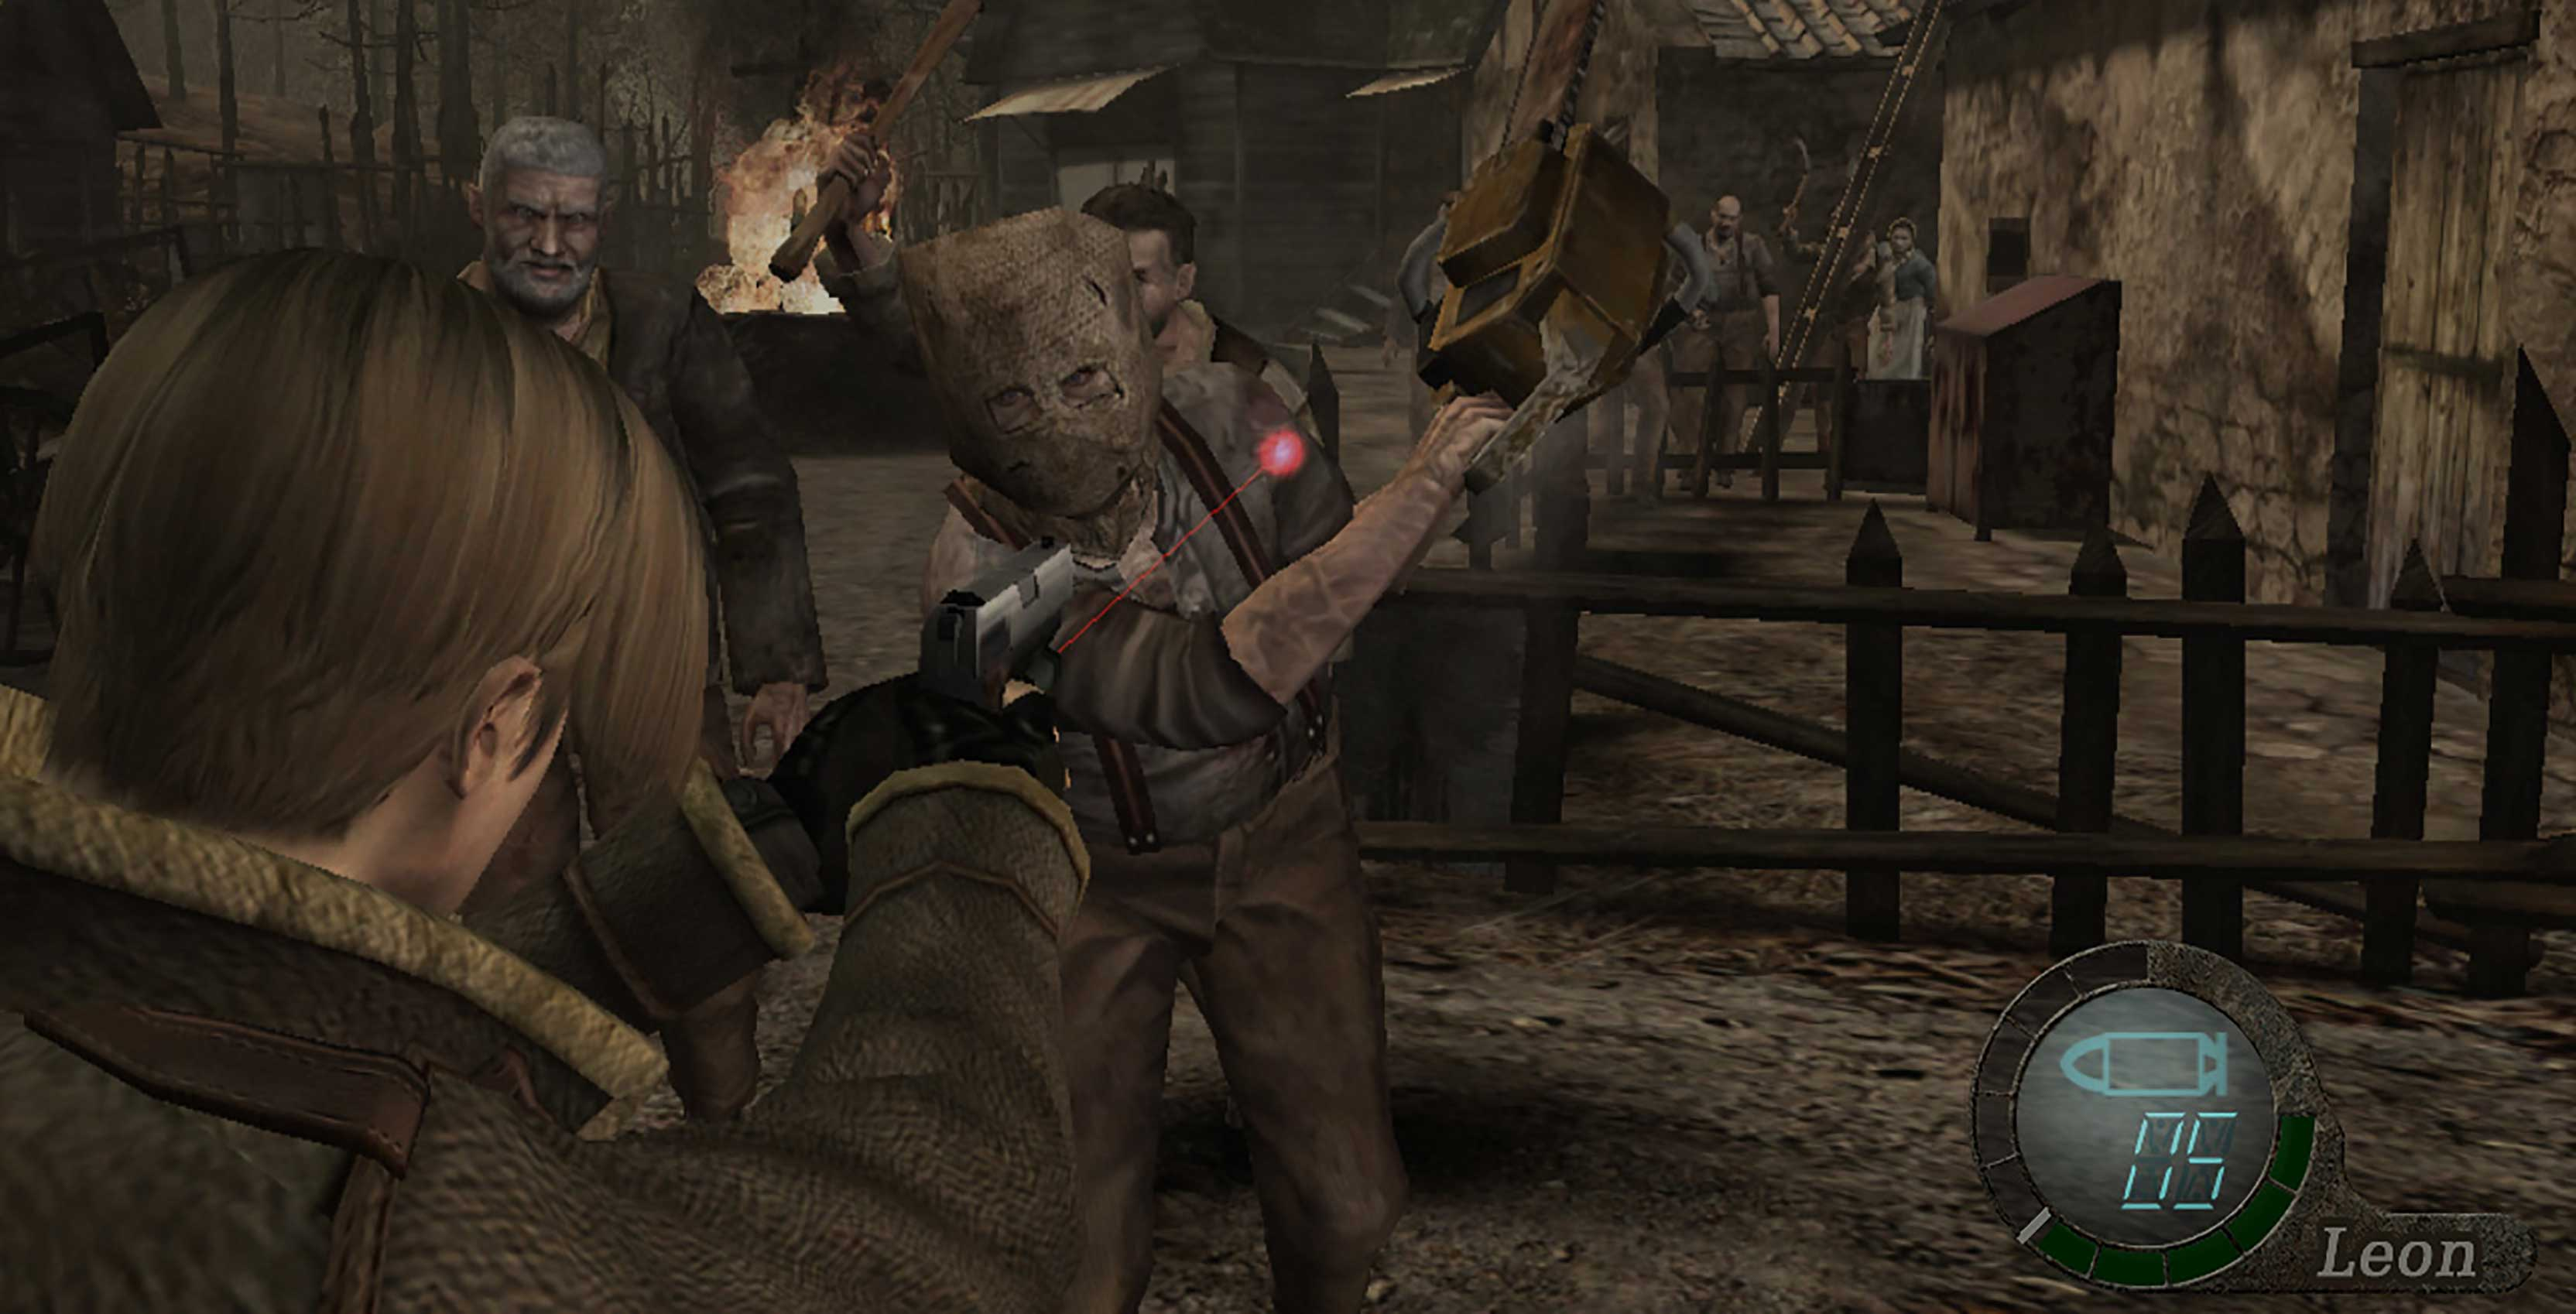 Nintendo Switch eShop discounts Resident Evil, Mortal Kombat and 2K games